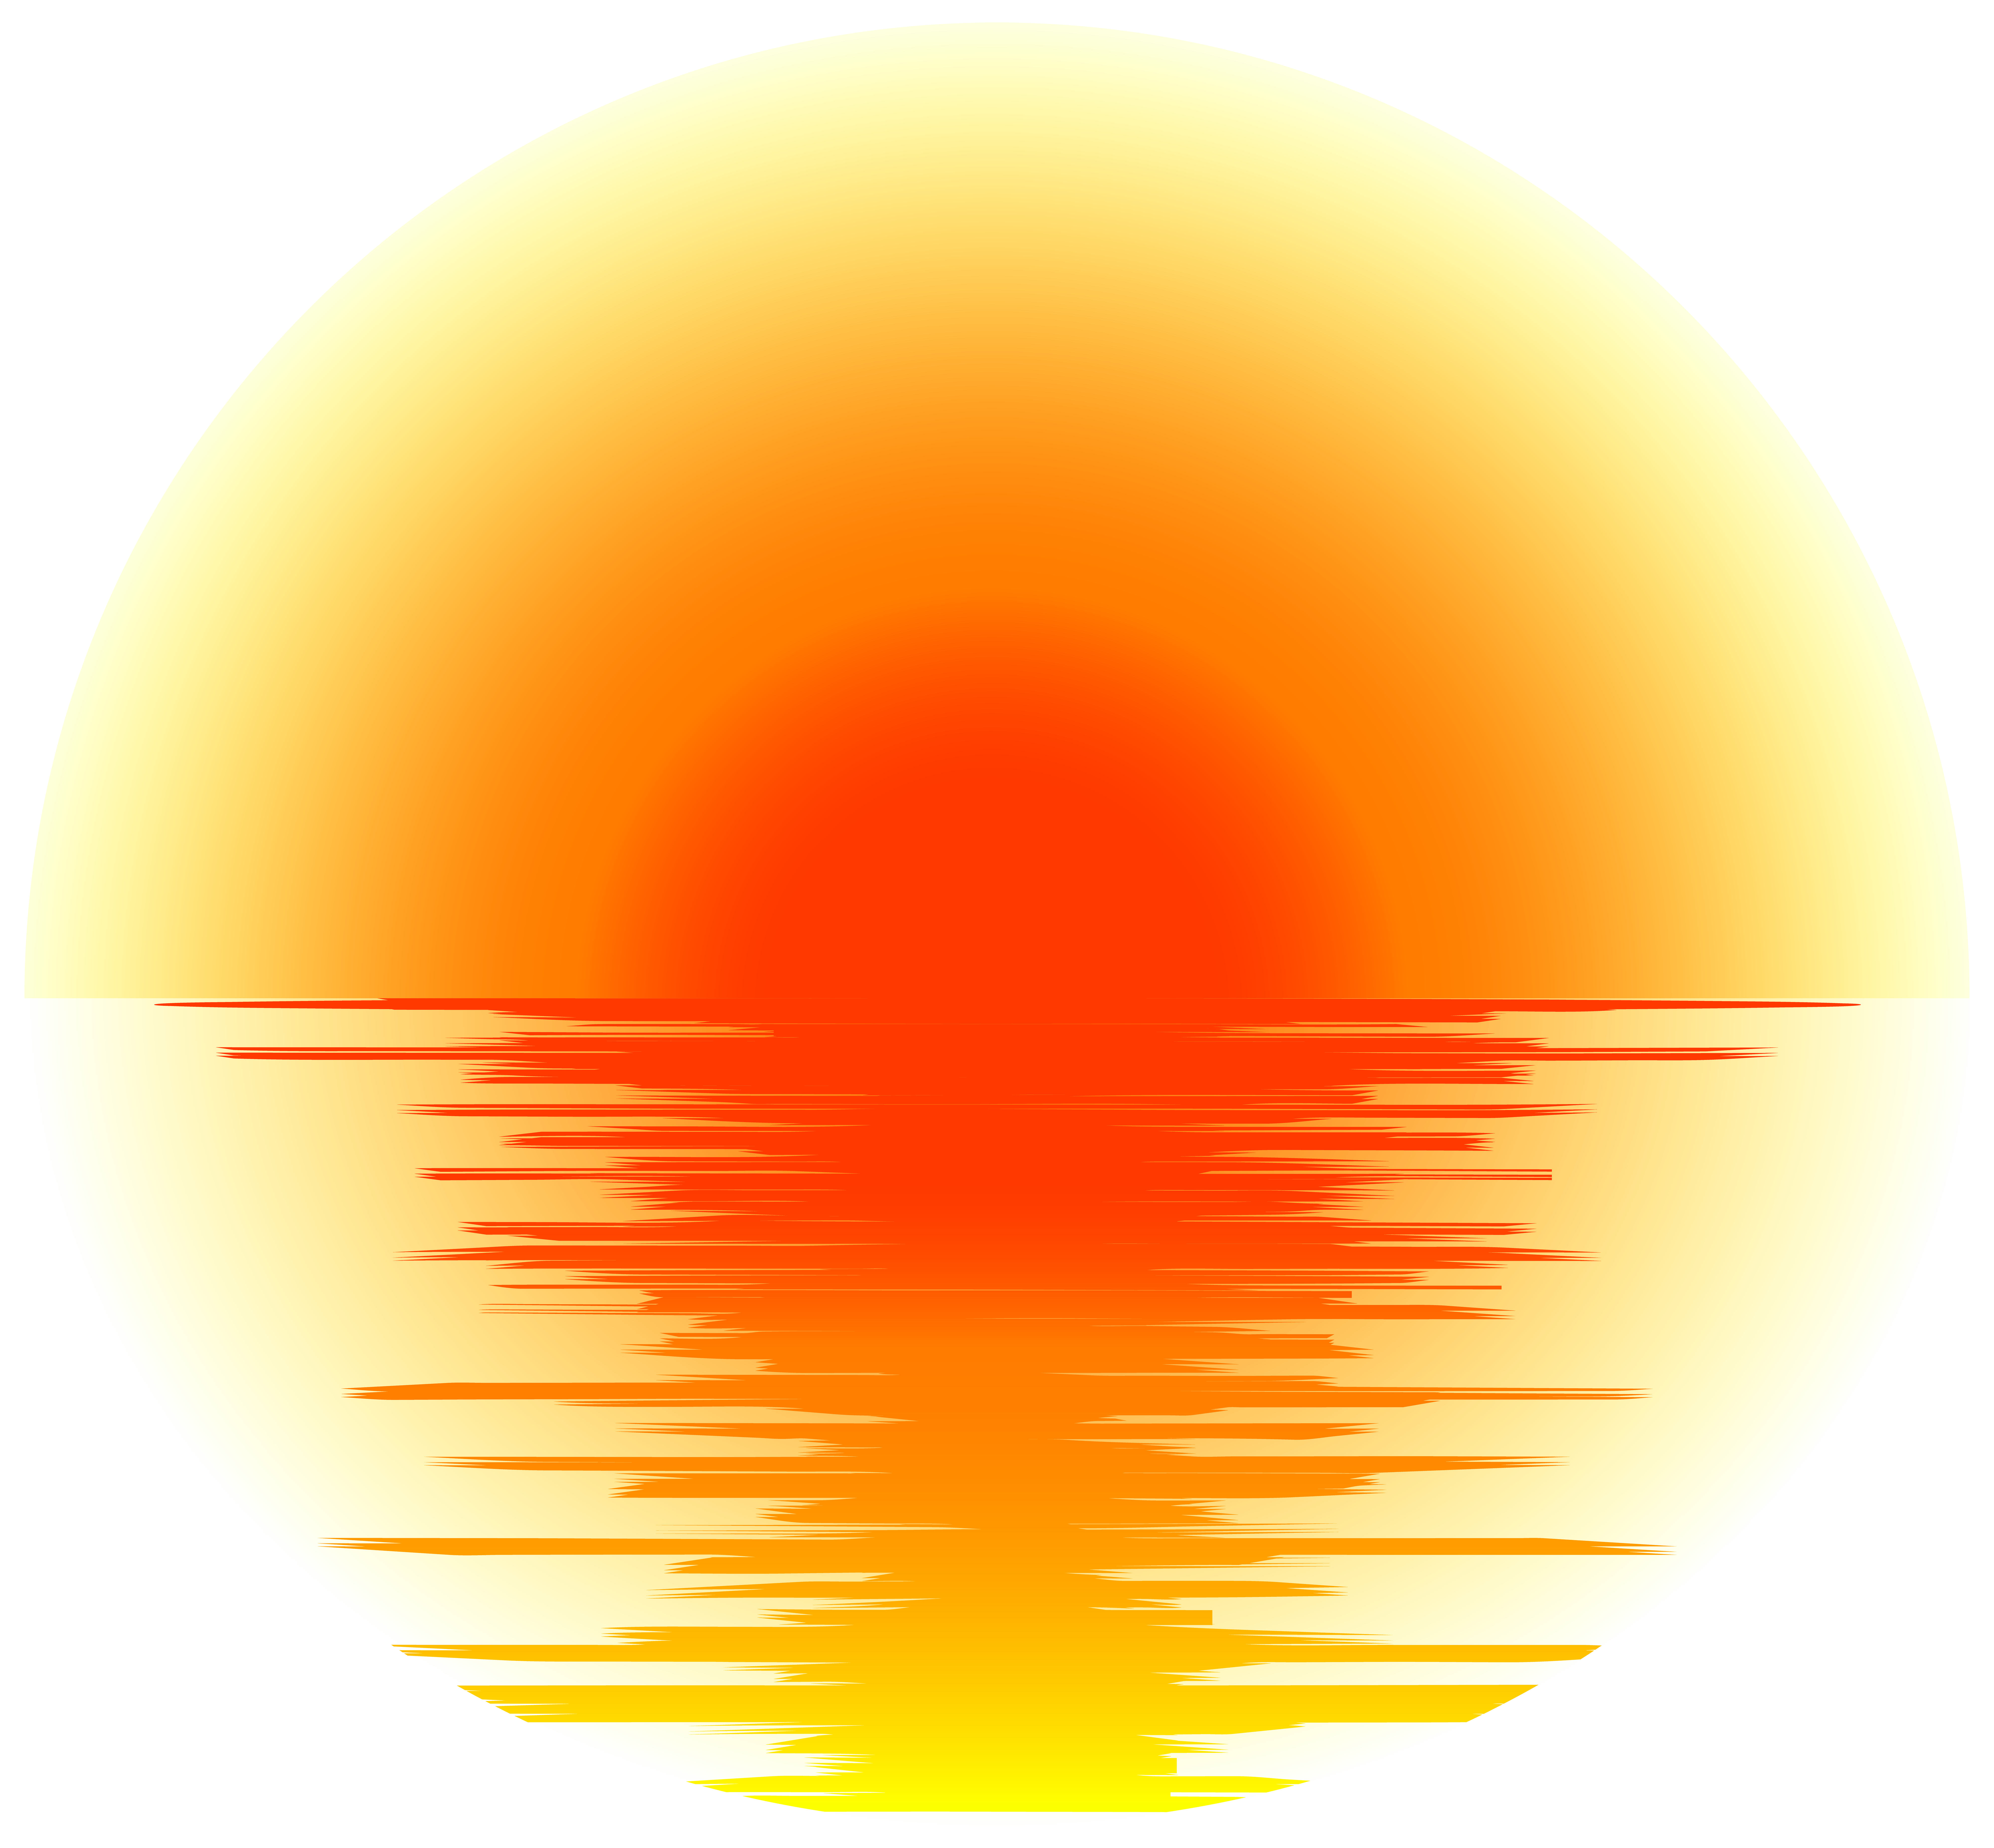 Sun set clipart image transparent Sunset Effect PNG Transparent Clip Art | Gallery Yopriceville ... image transparent